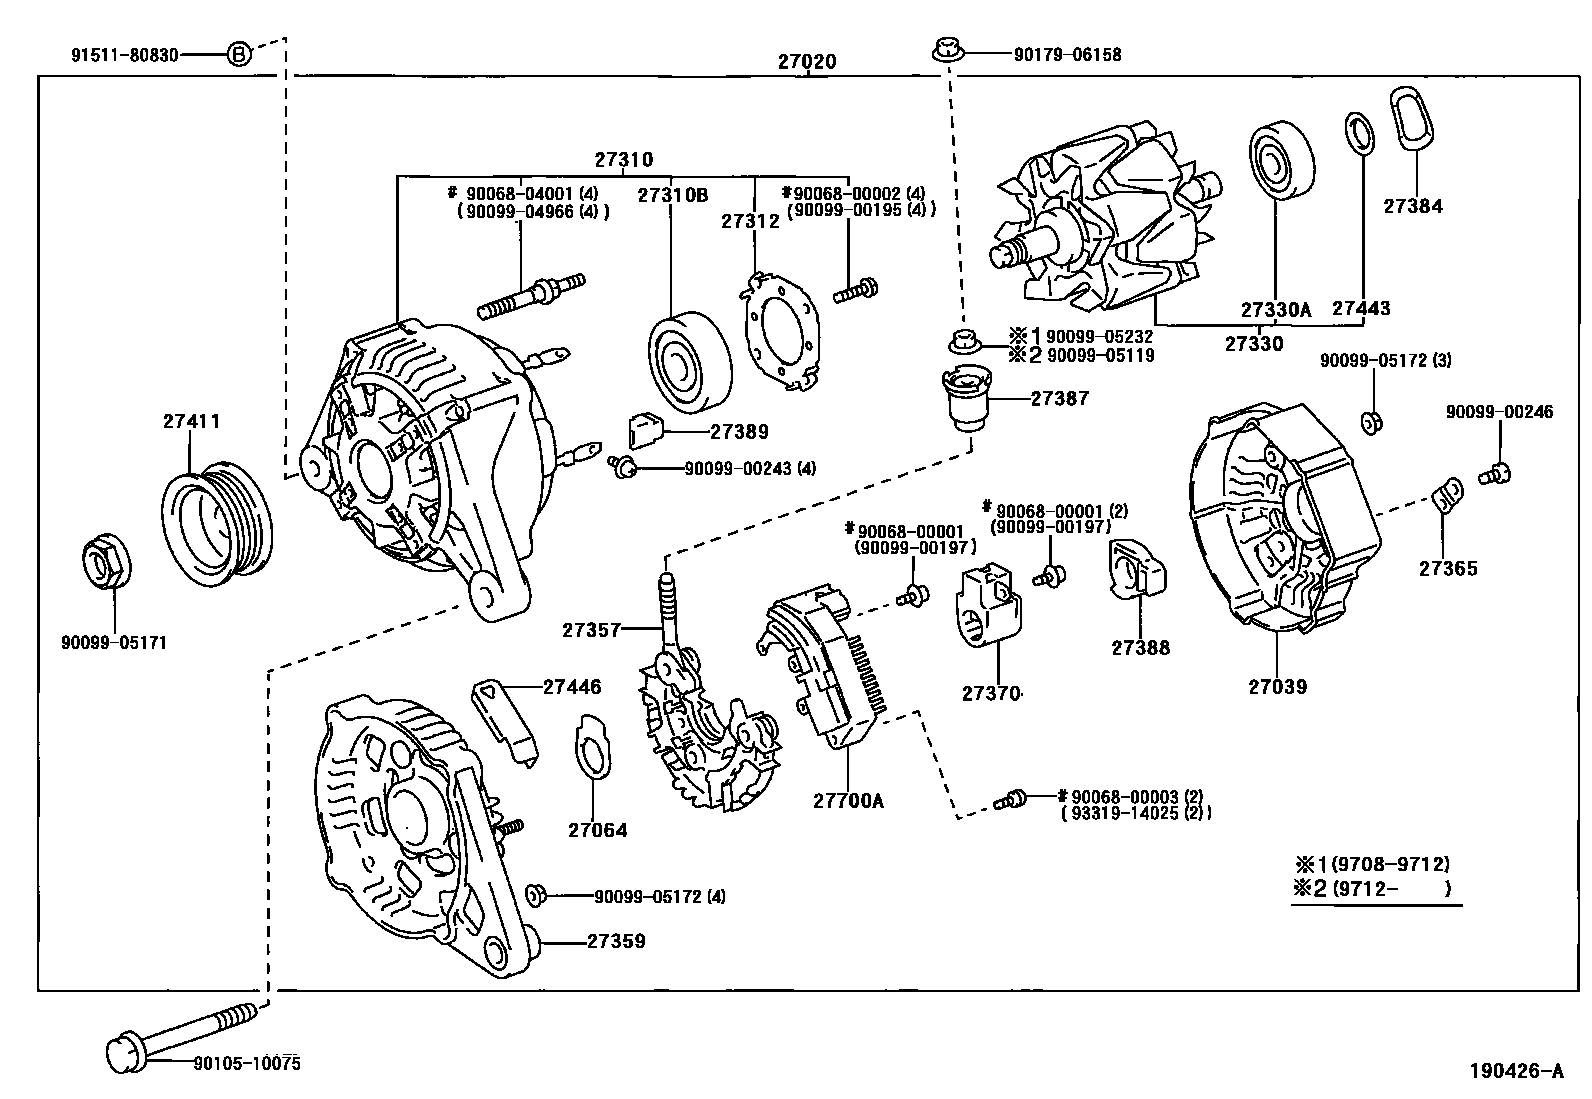 Toyota Corolla Manual Transmission Diagram Reveolution Of Wiring 2001 Ford Escape Honda 5 Speed Image Details Rh Motogurumag Com 1994